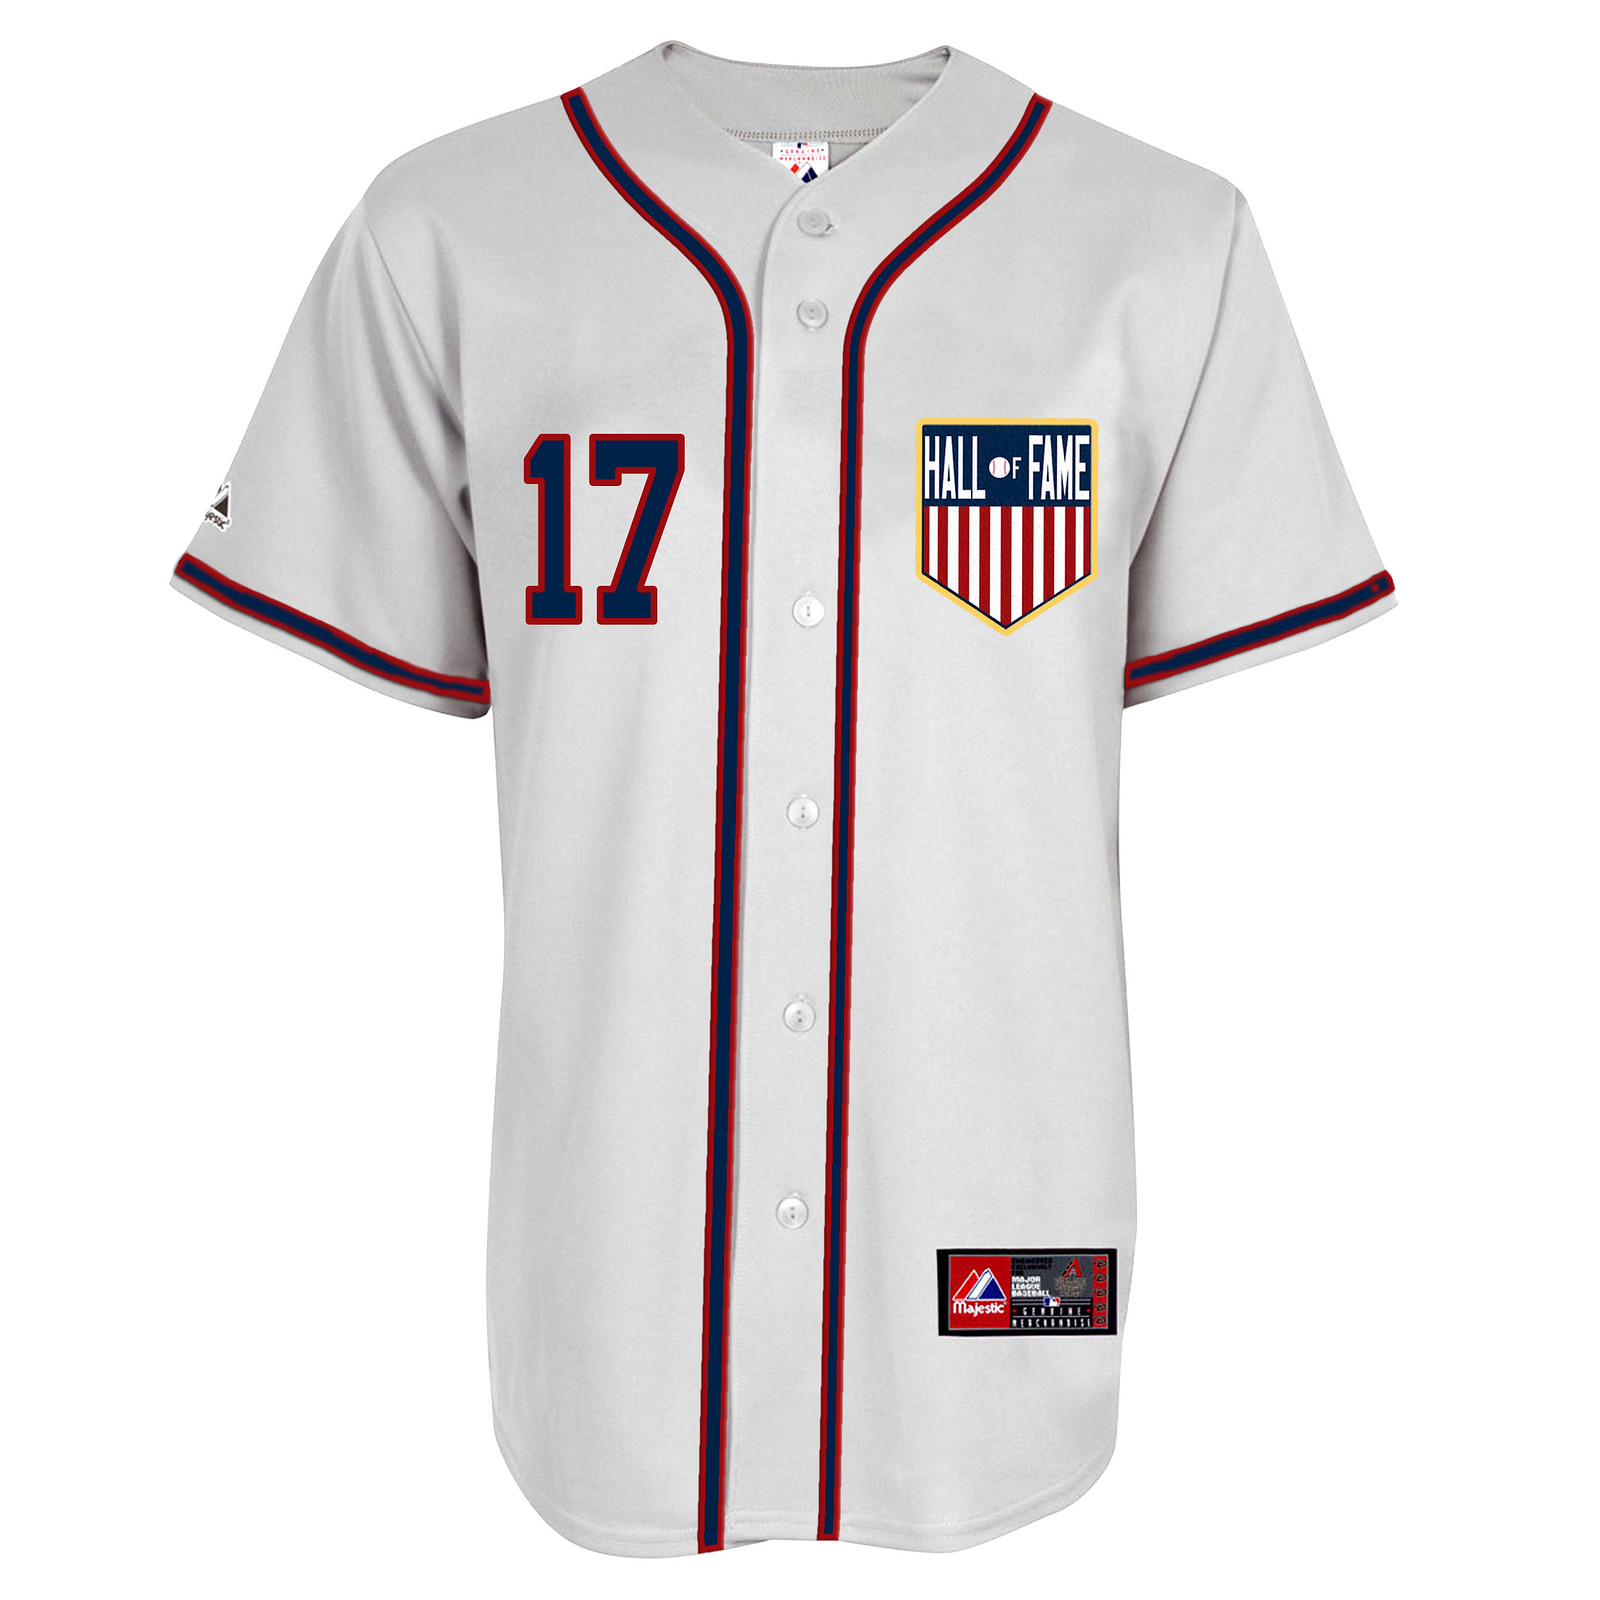 e7b391b2 Baseball Hall of Fame Jersey-Redesign Results | Uni Watch